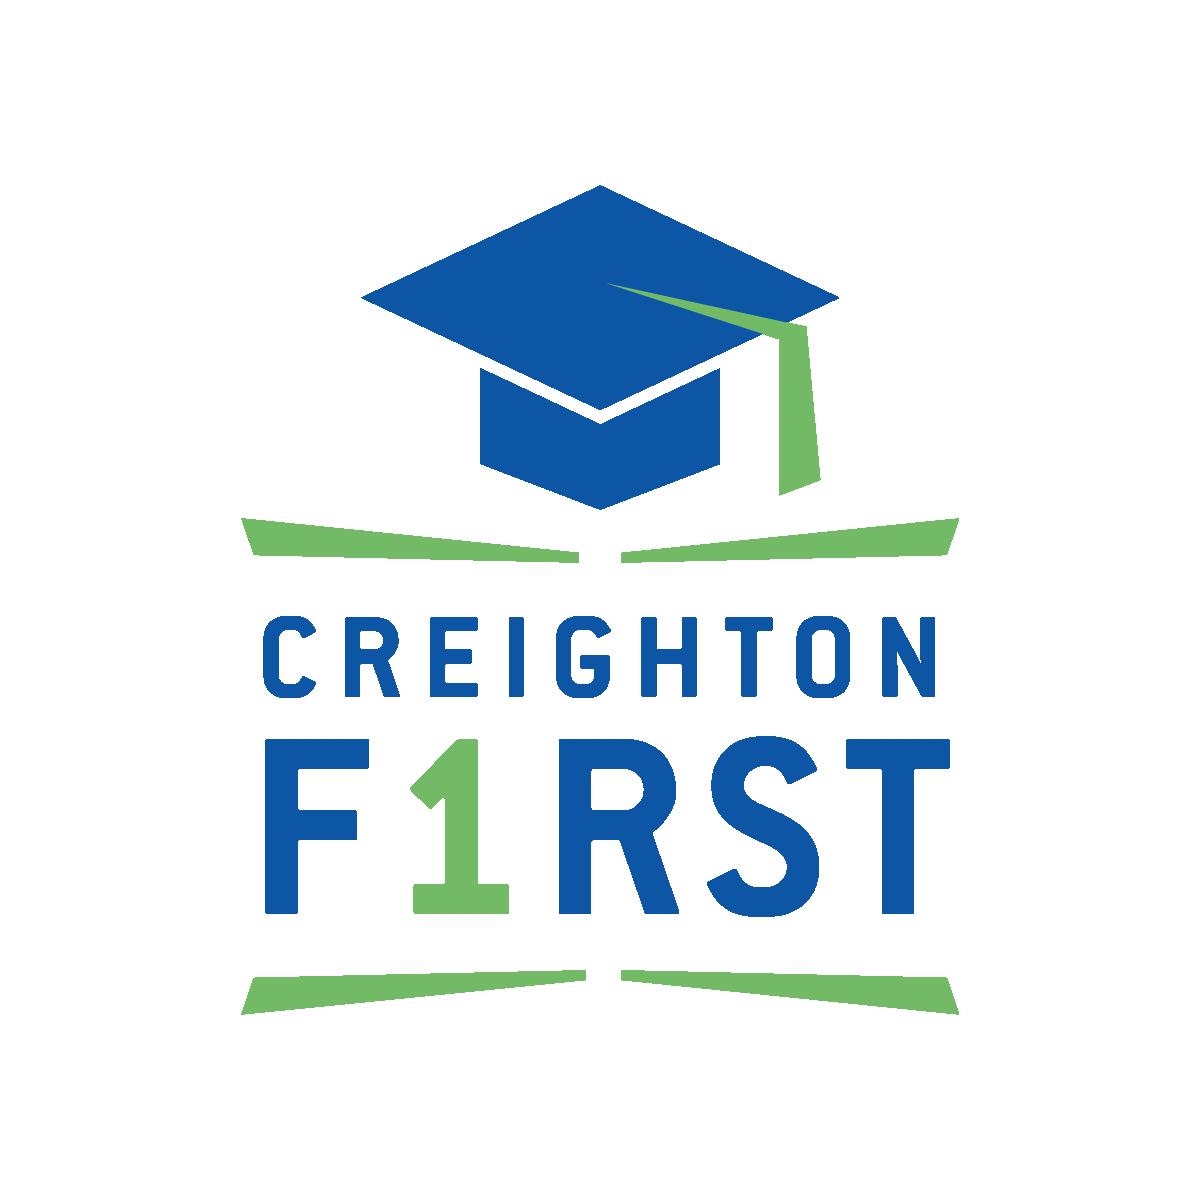 Creighton First